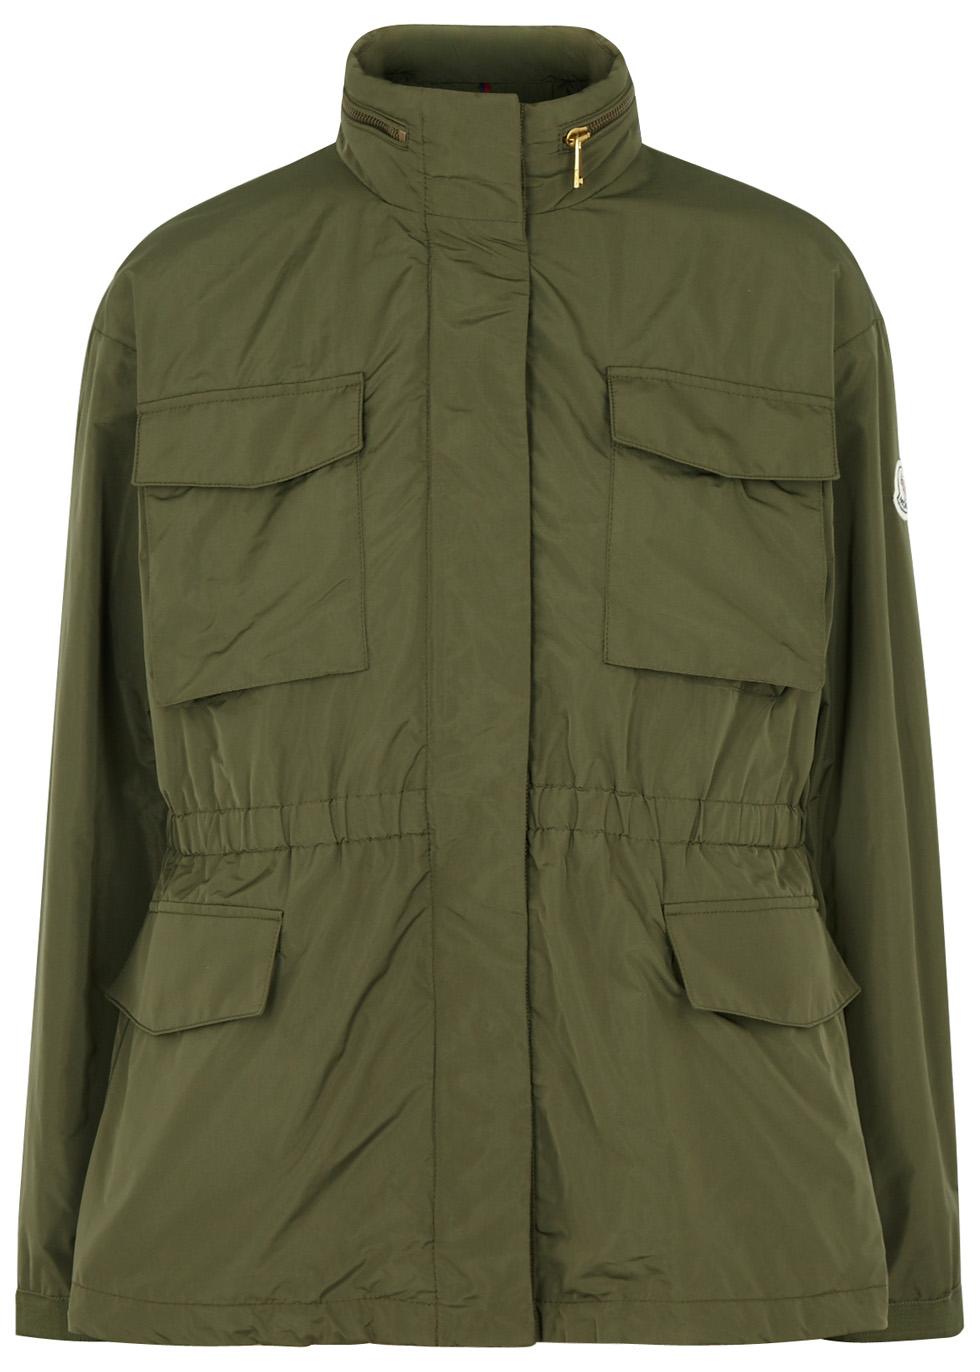 Aventurine olive taffeta jacket - Moncler